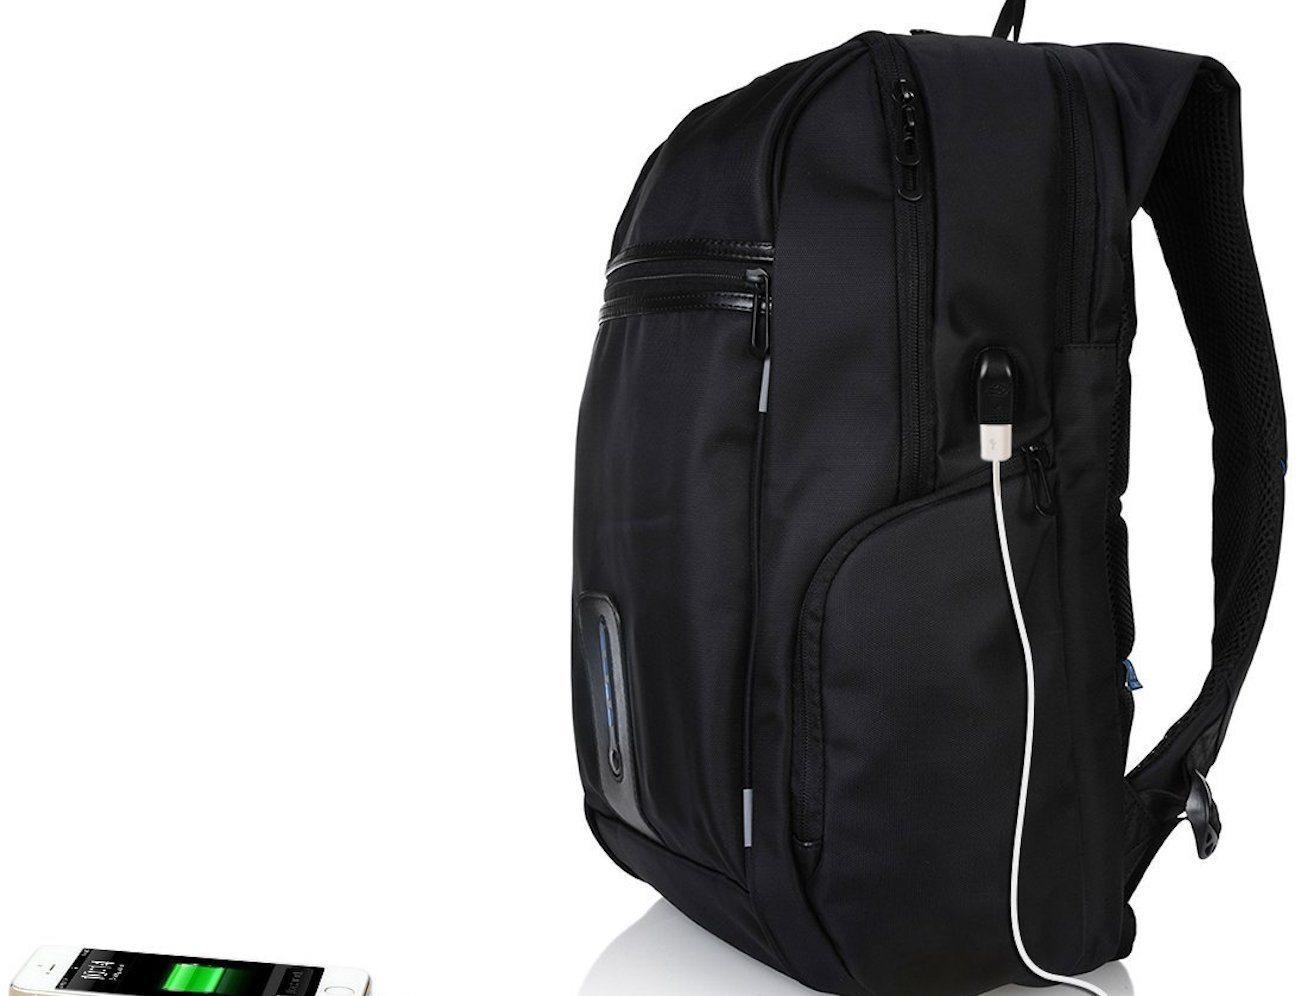 TRAKK FUEL Anti-Theft Backpack